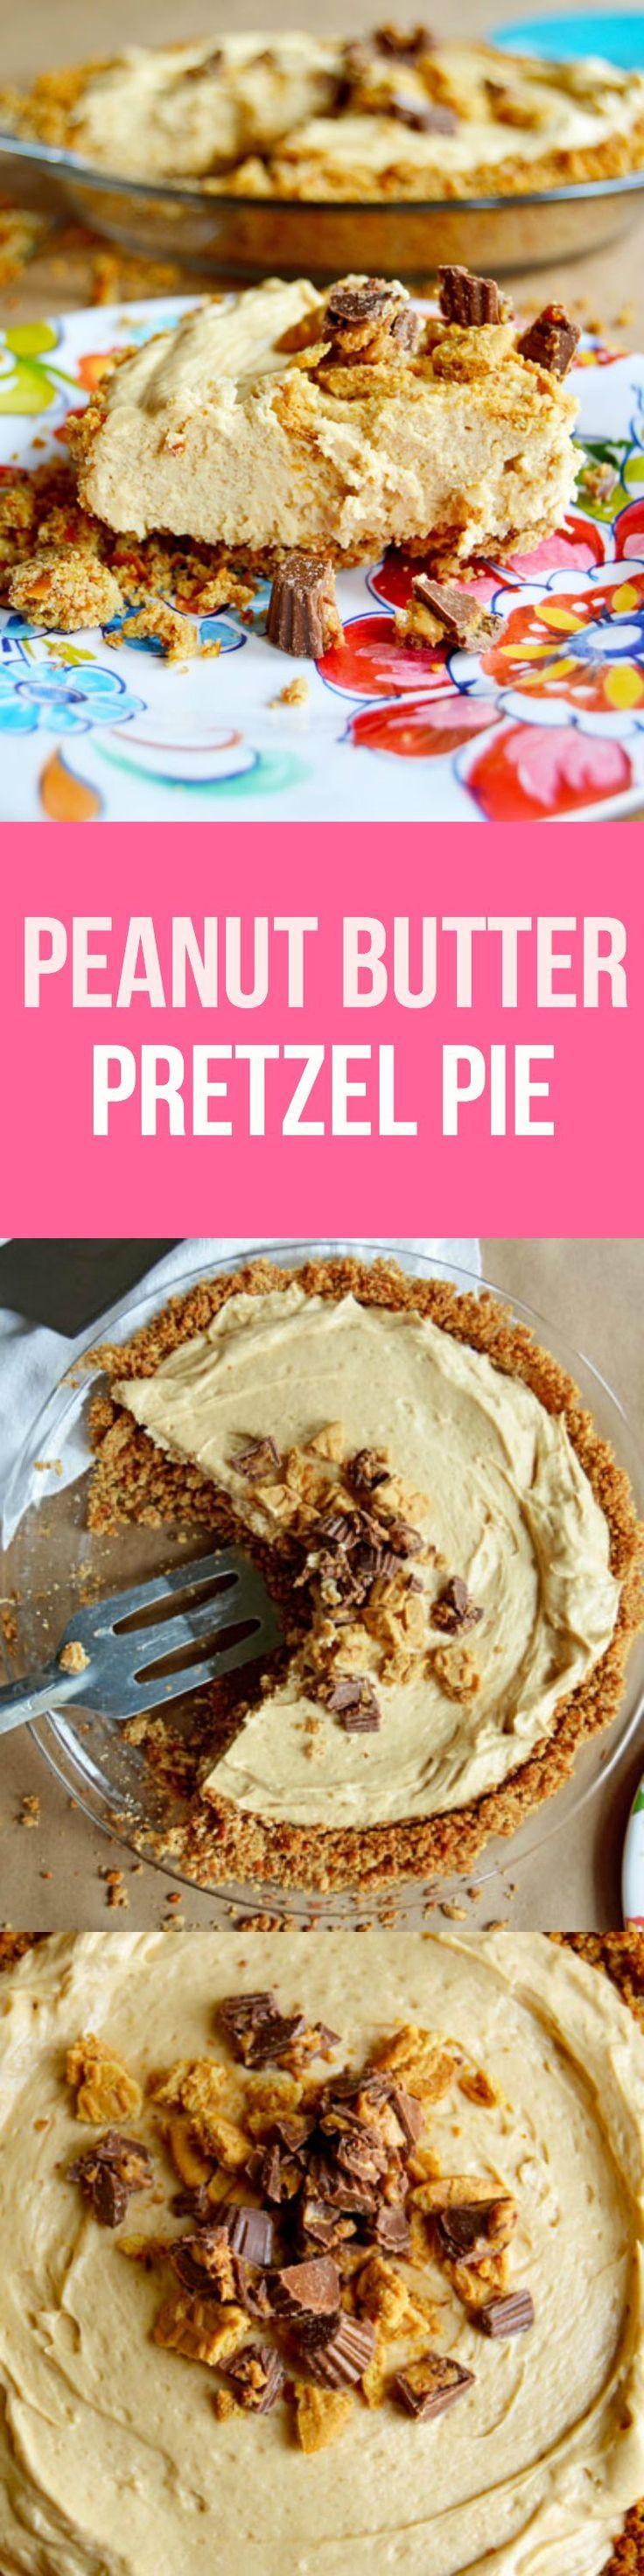 Peanut Butter Pretzel Pie | Recipe | Dessert recipes, Desserts and ...